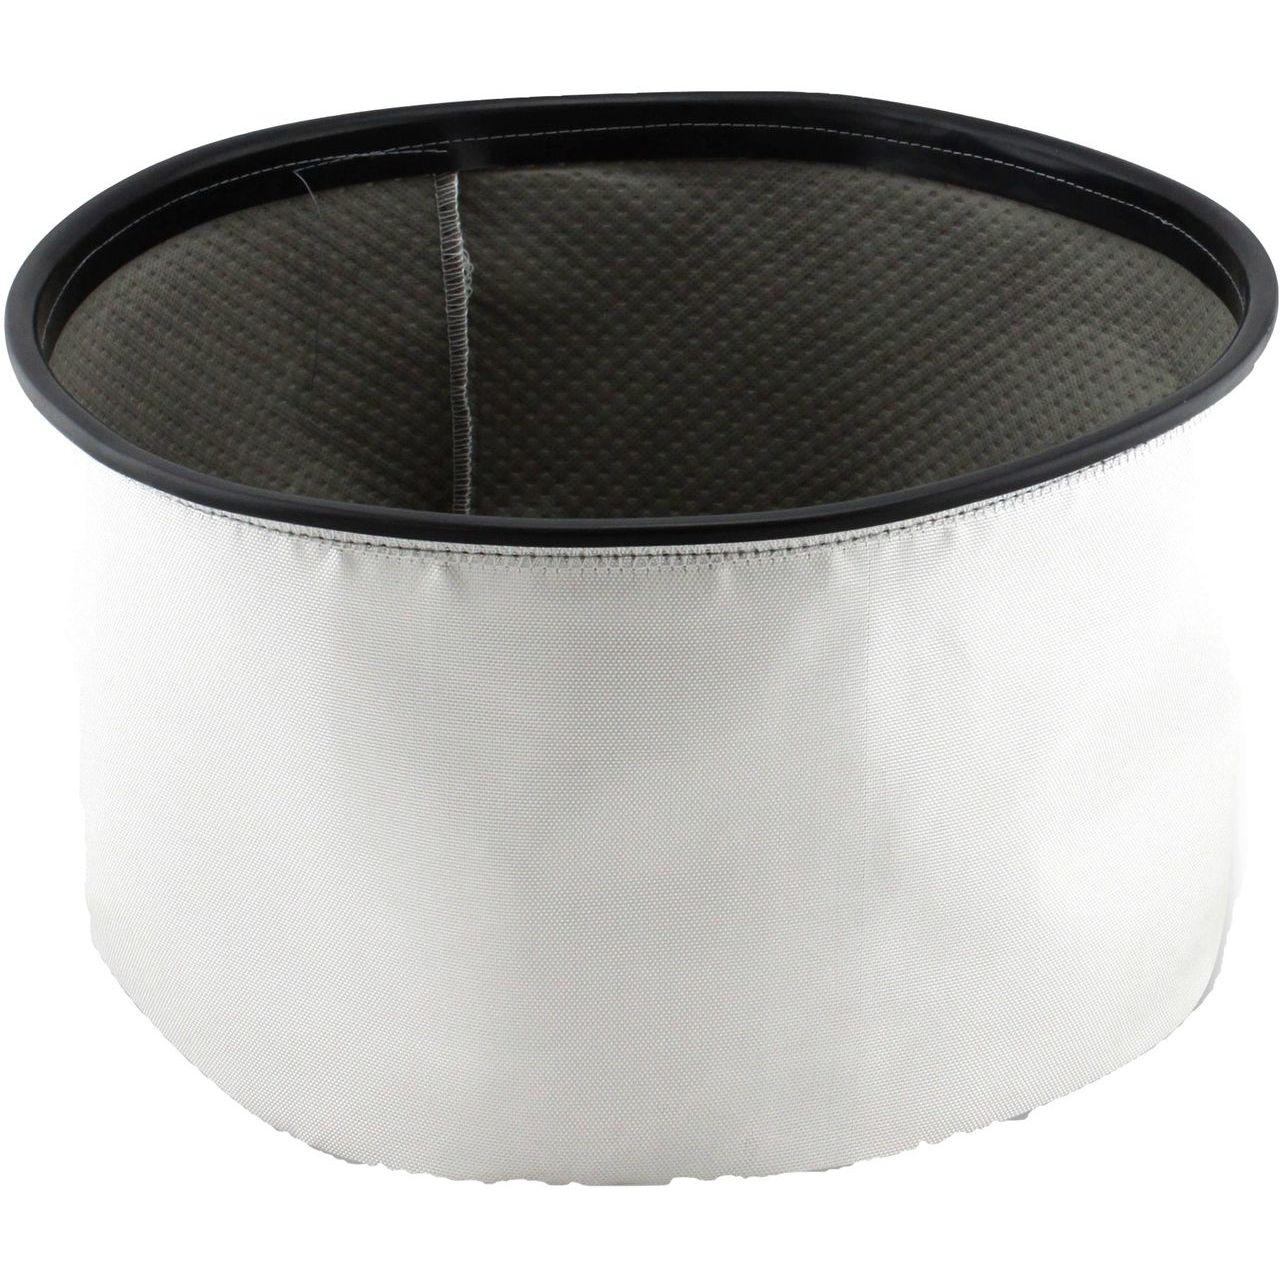 WPPO Replacement Fire Retardant Filter For Ash Vacuum